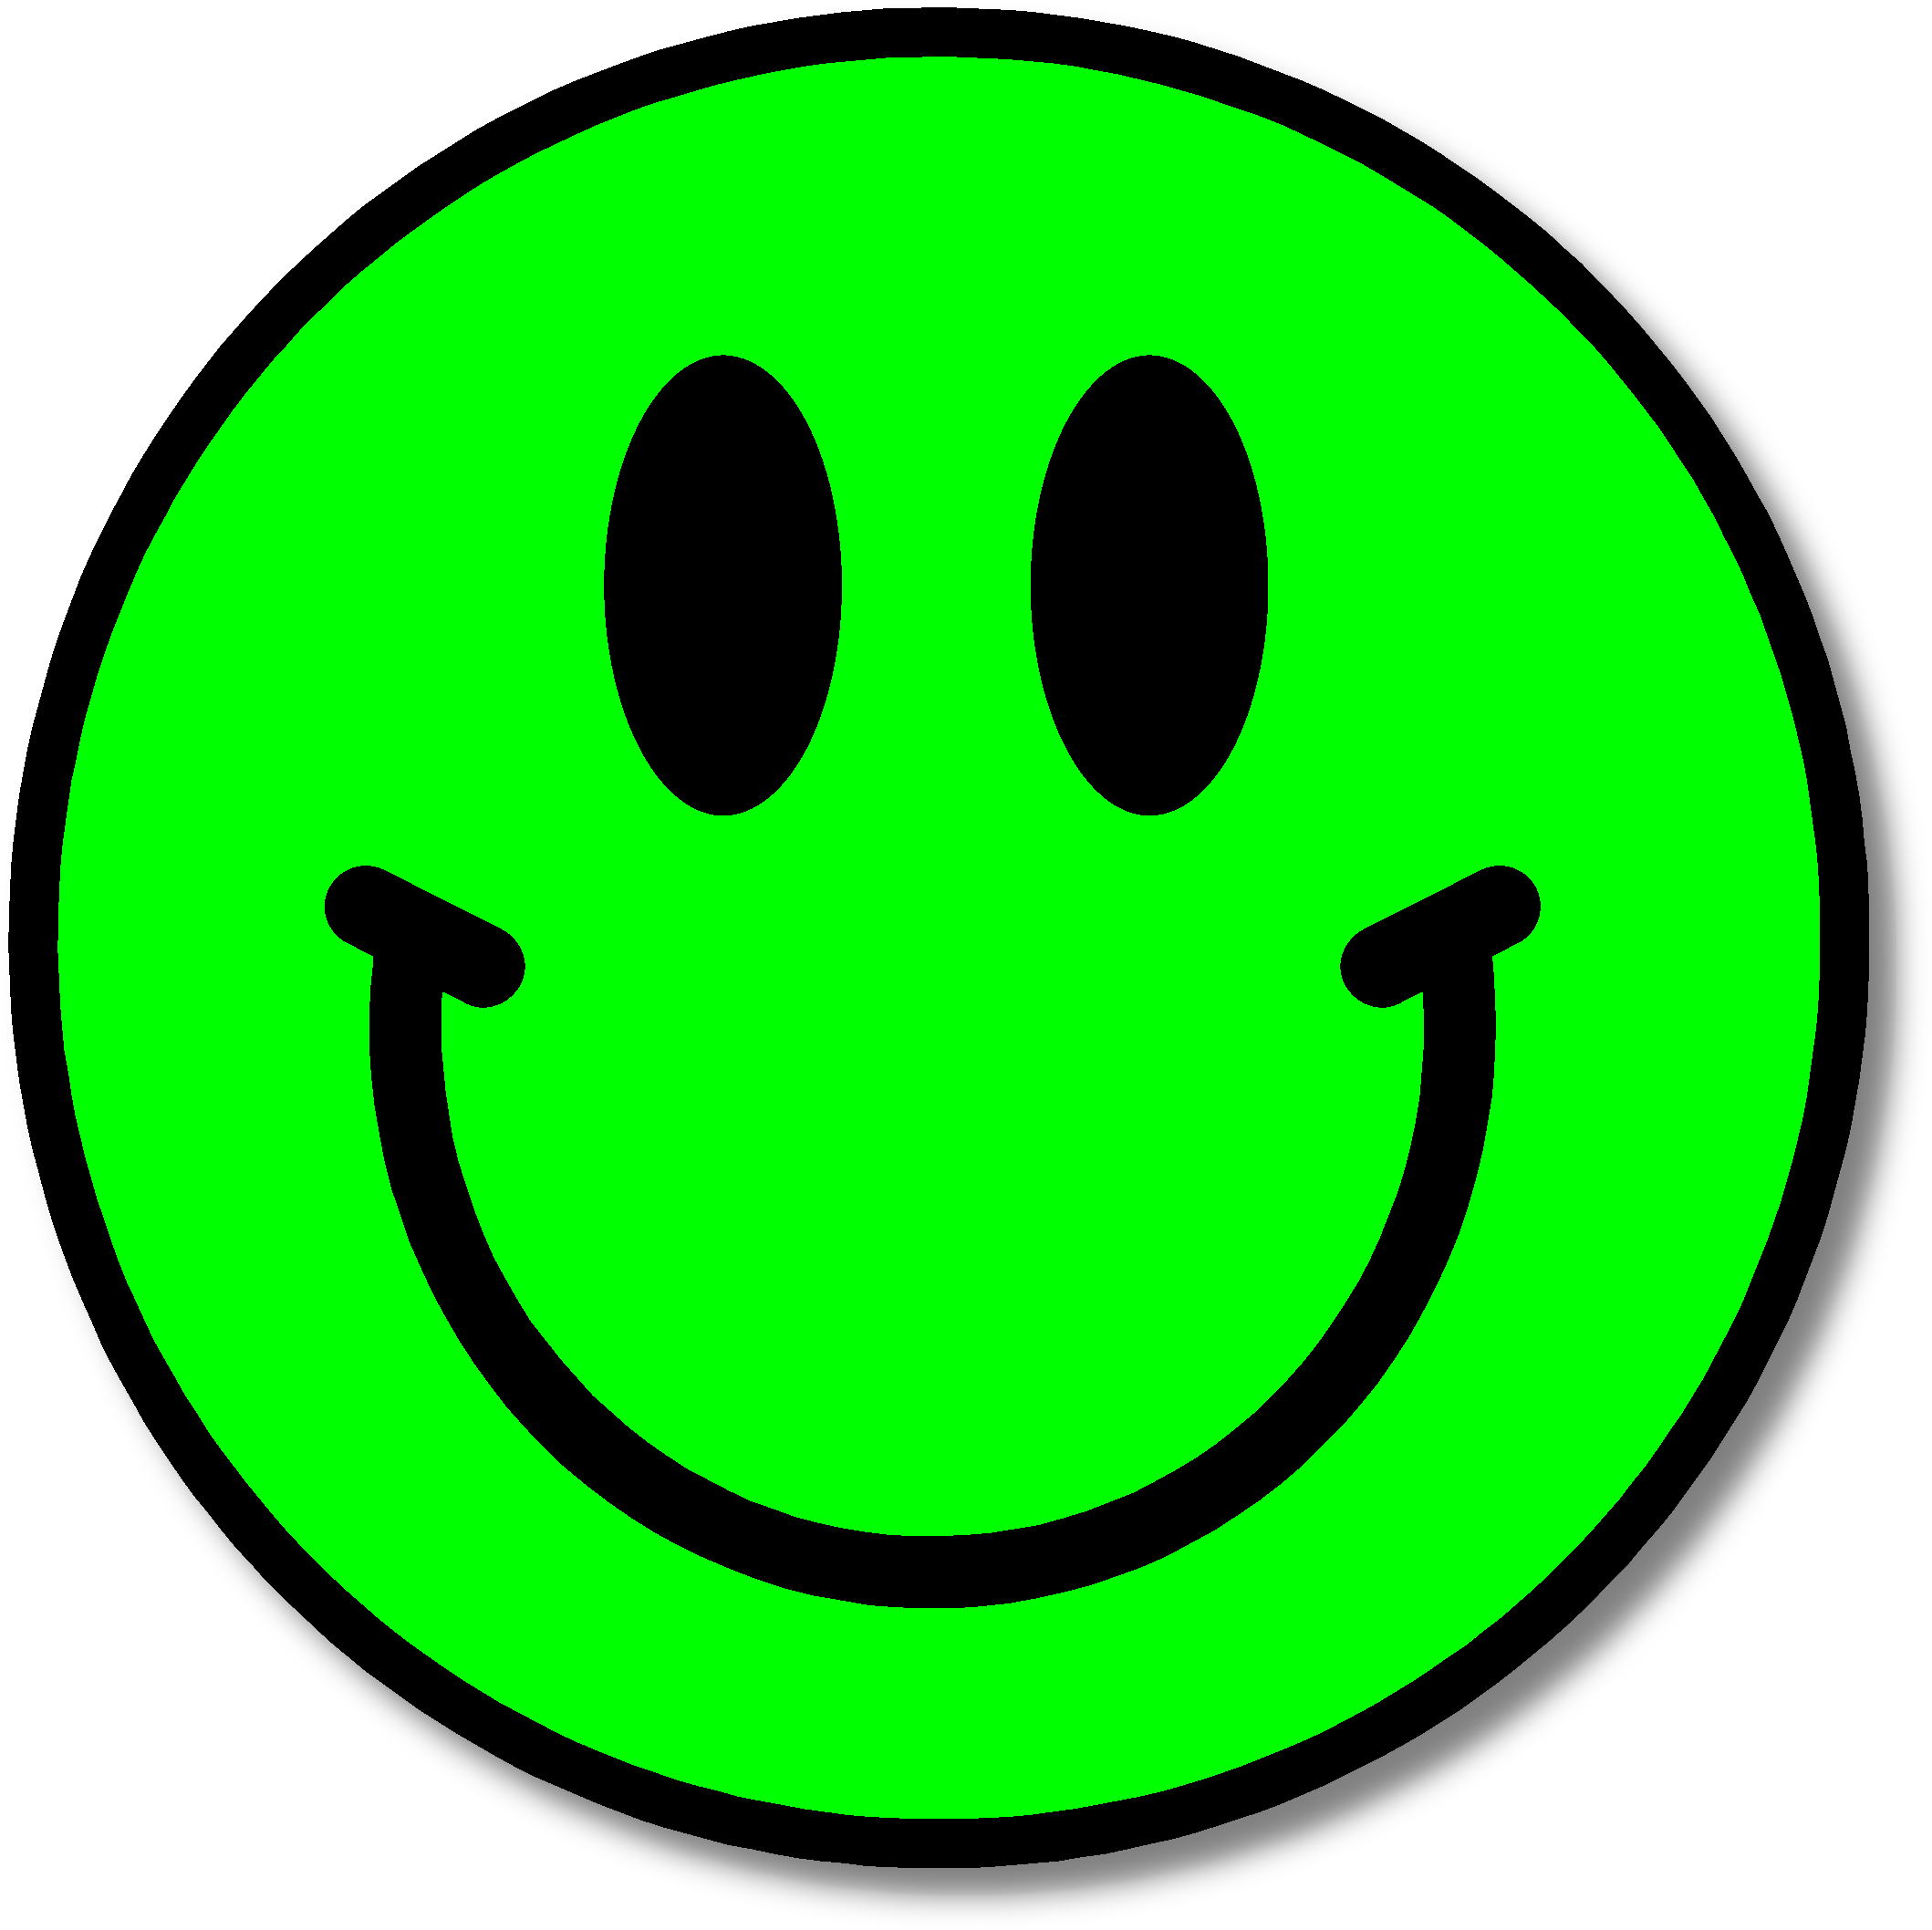 Green Happy Face